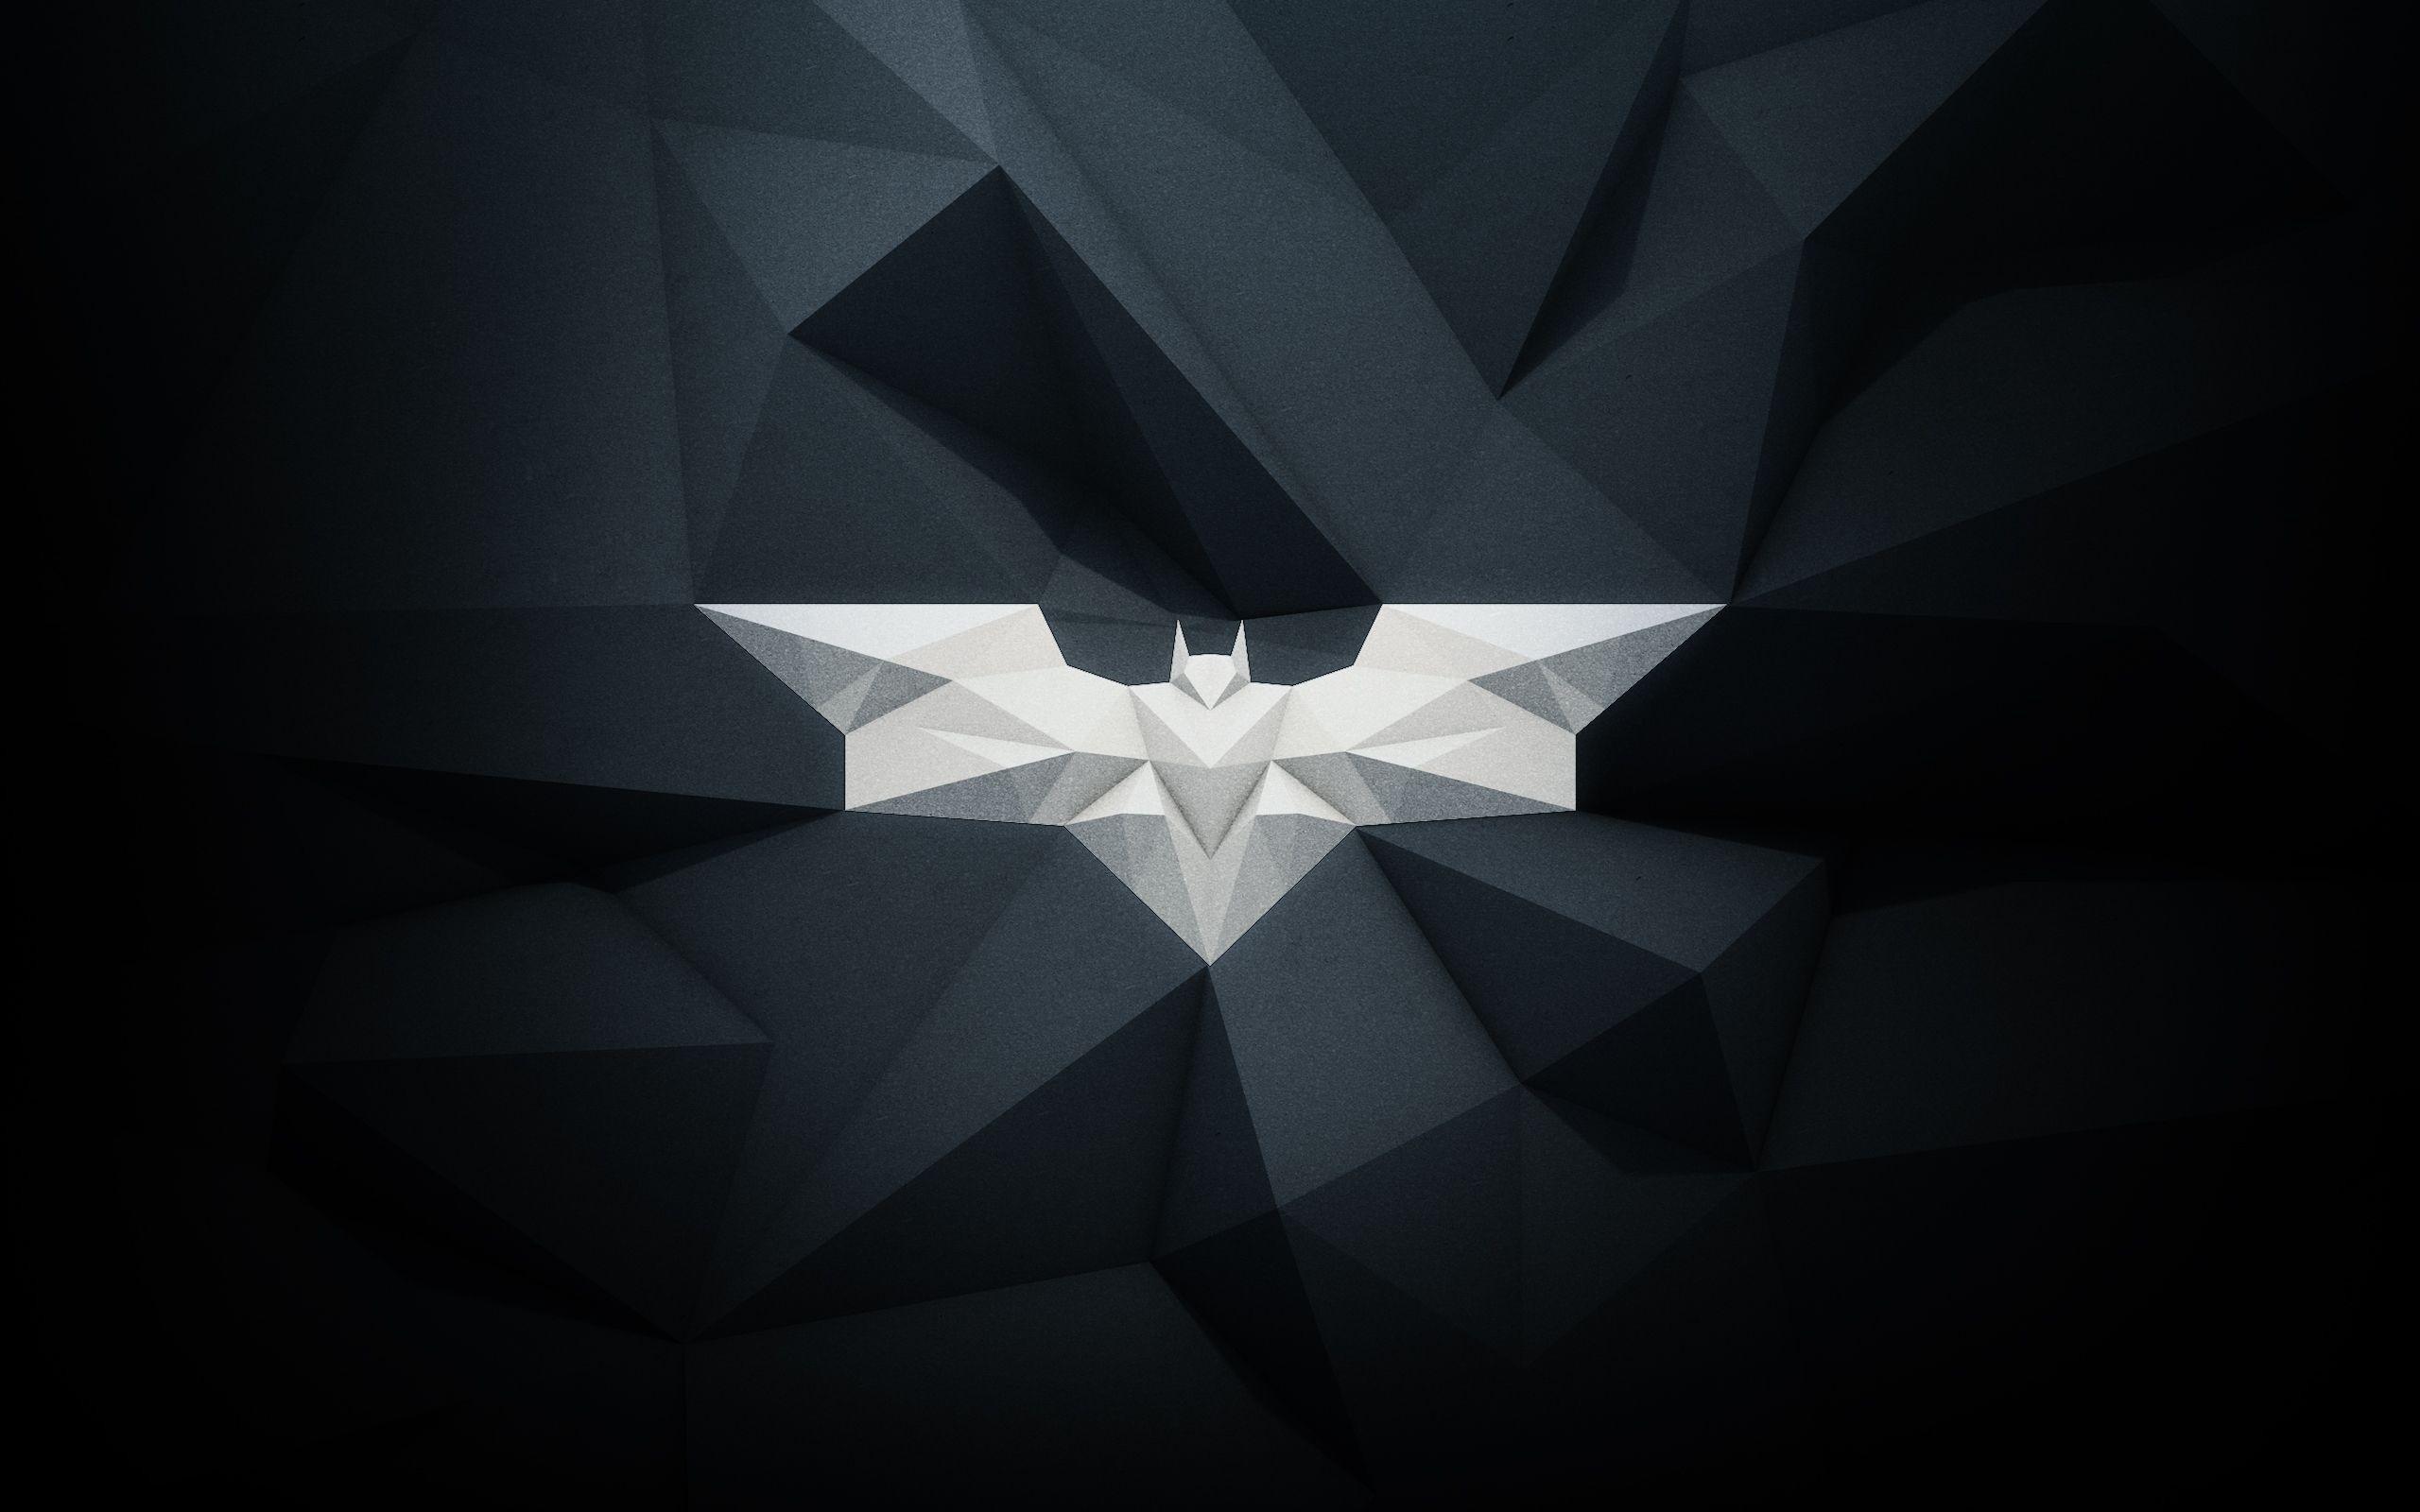 Batman hd wallpaper background   HD Wallpapers 2560x1600